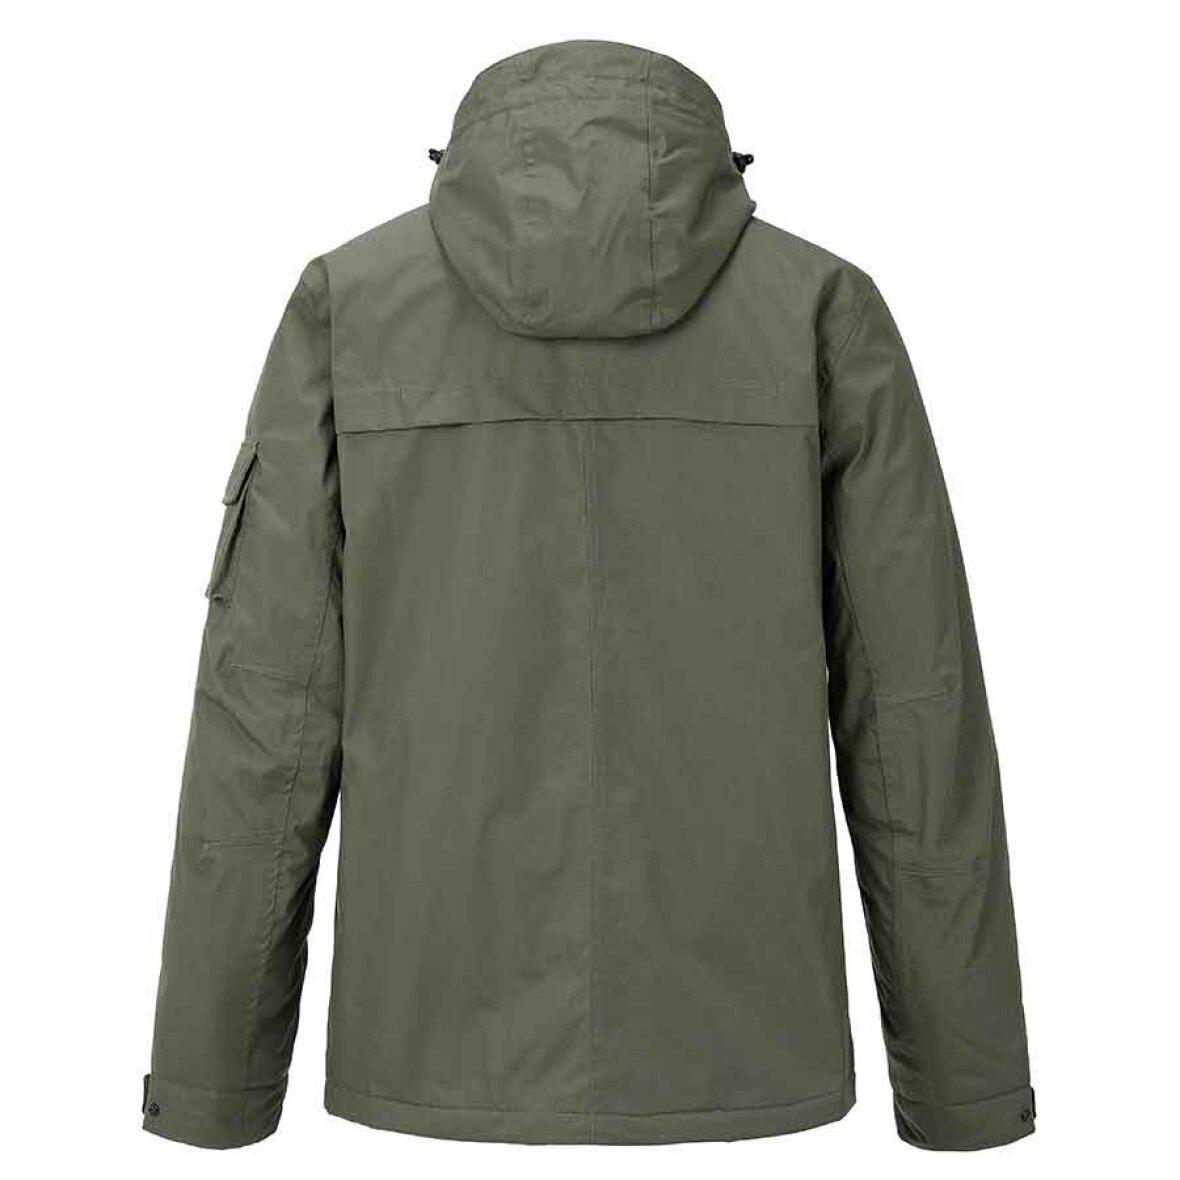 88f88a54db8 Vinter jakke bygget på rå kvalitet   Tenson - Danny M Khaki - køb her!